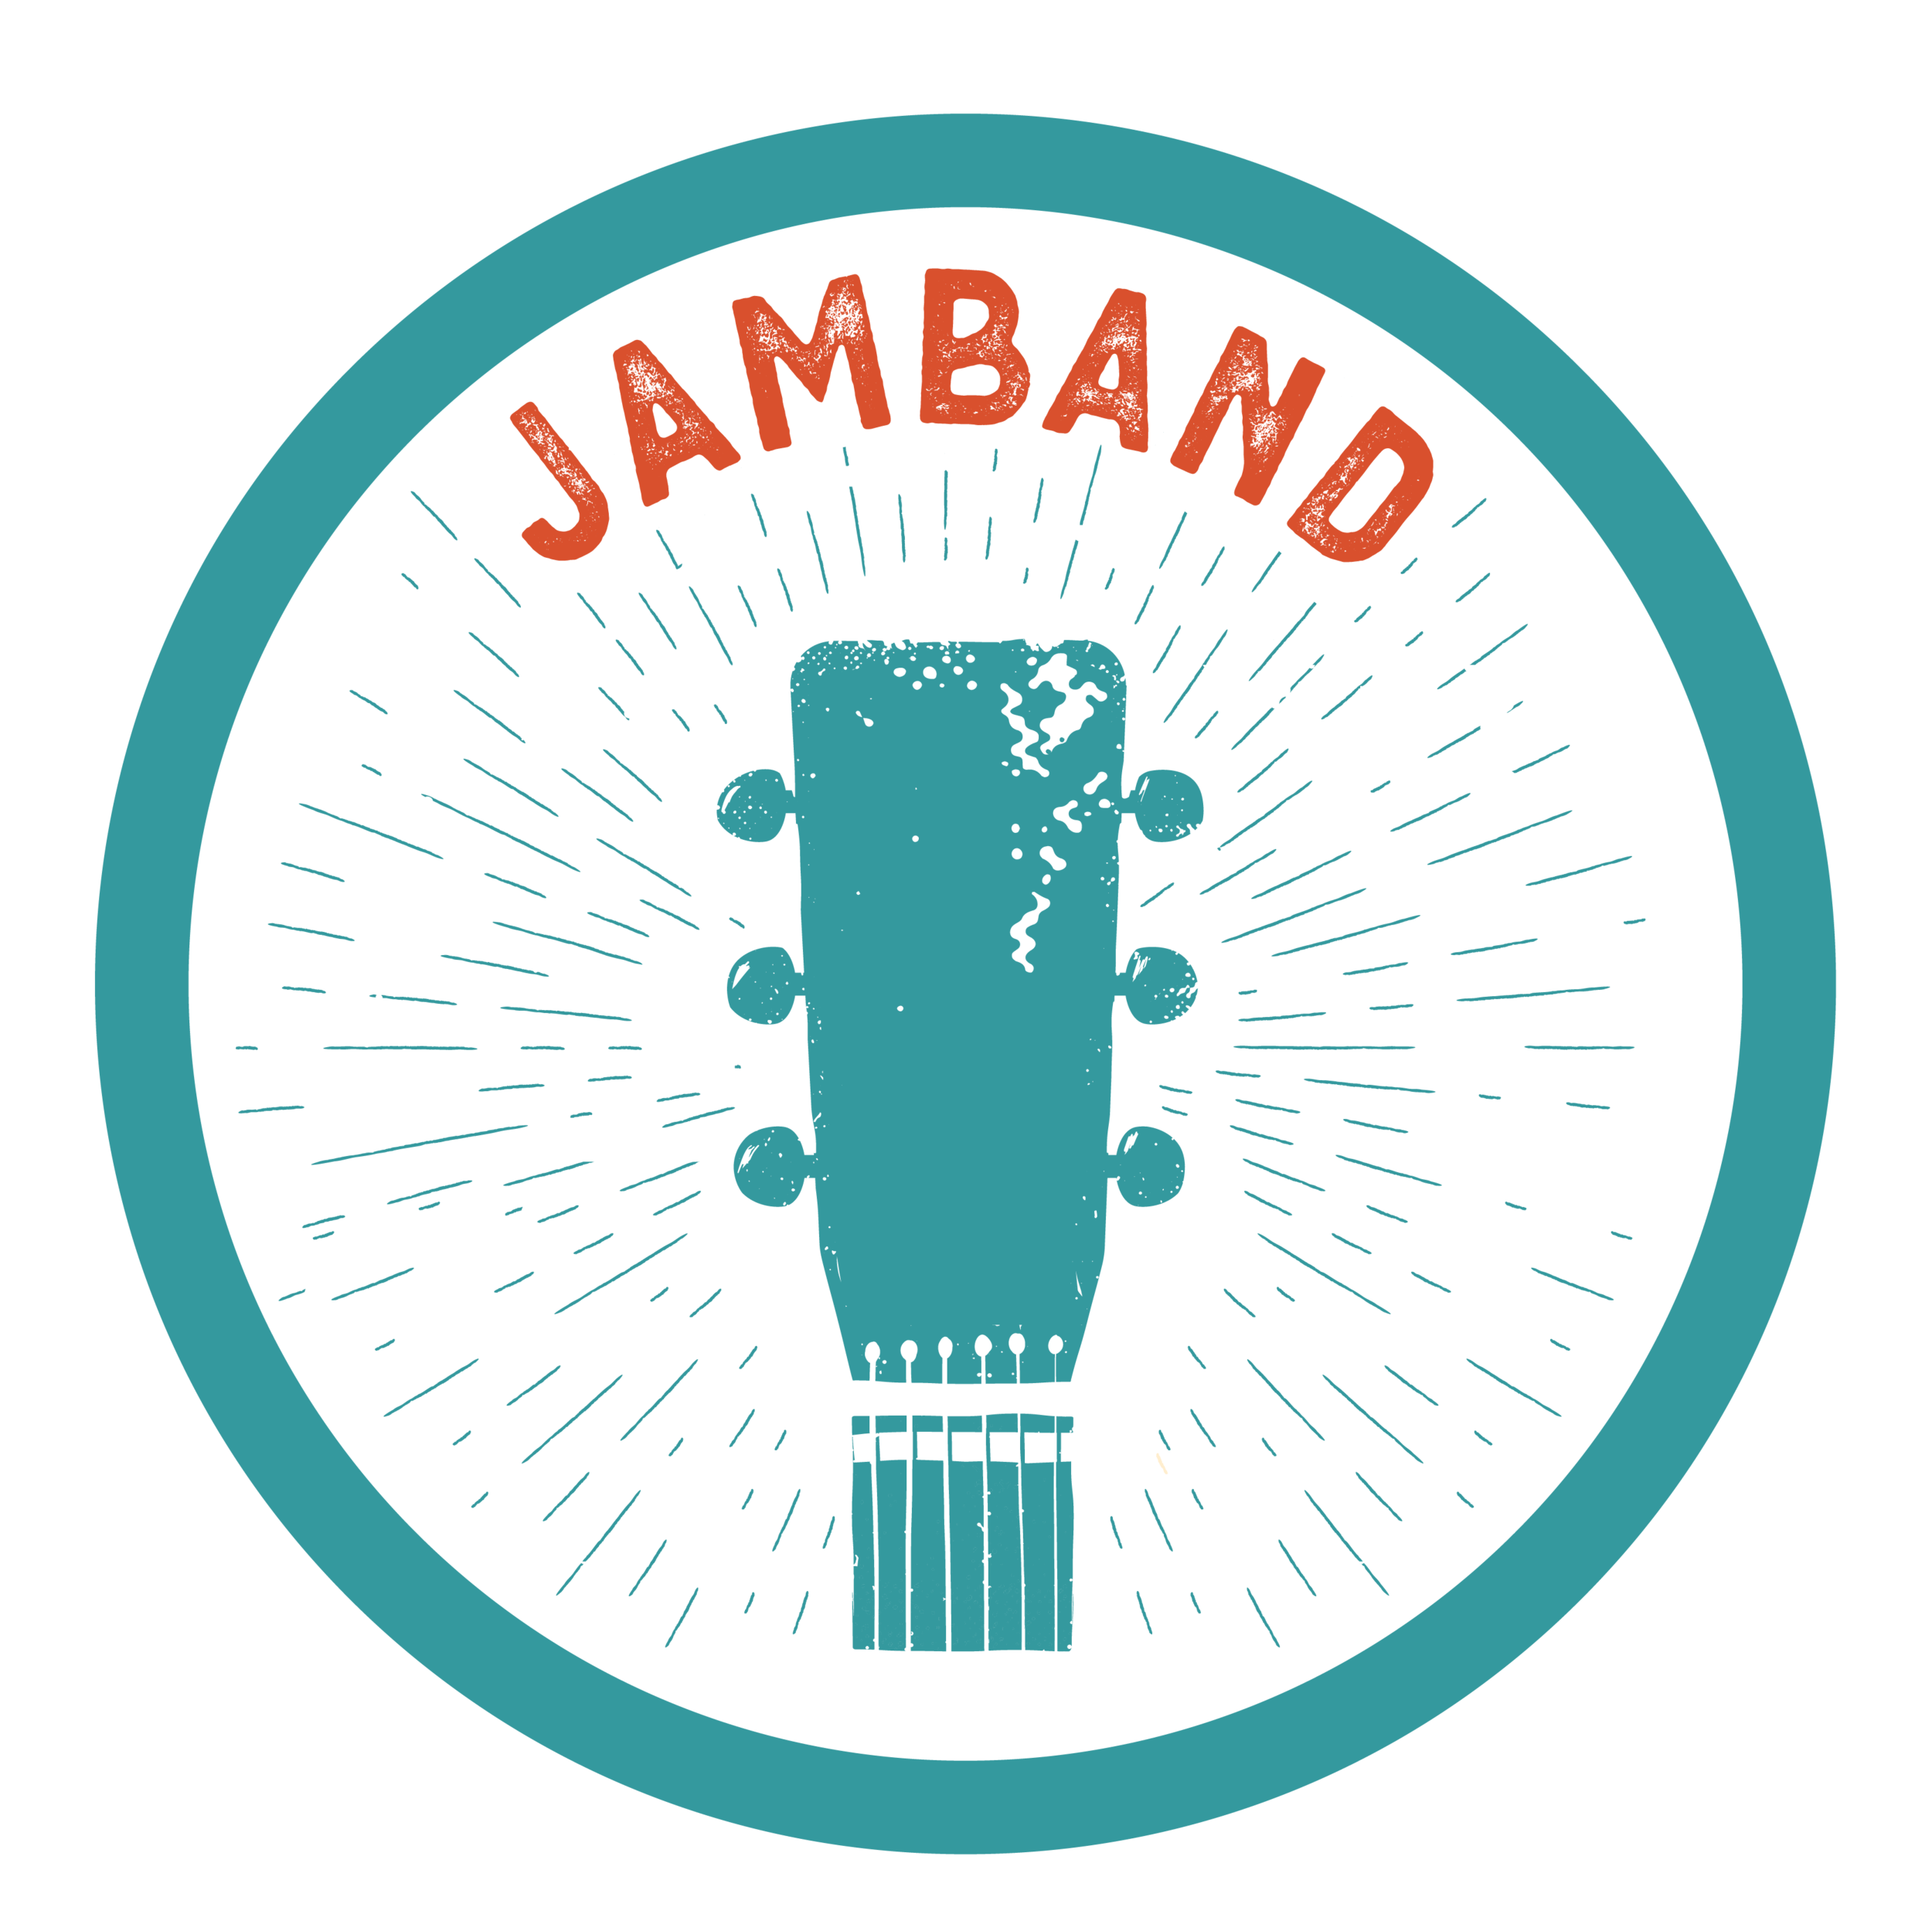 JWY_Classes_JamBand.png